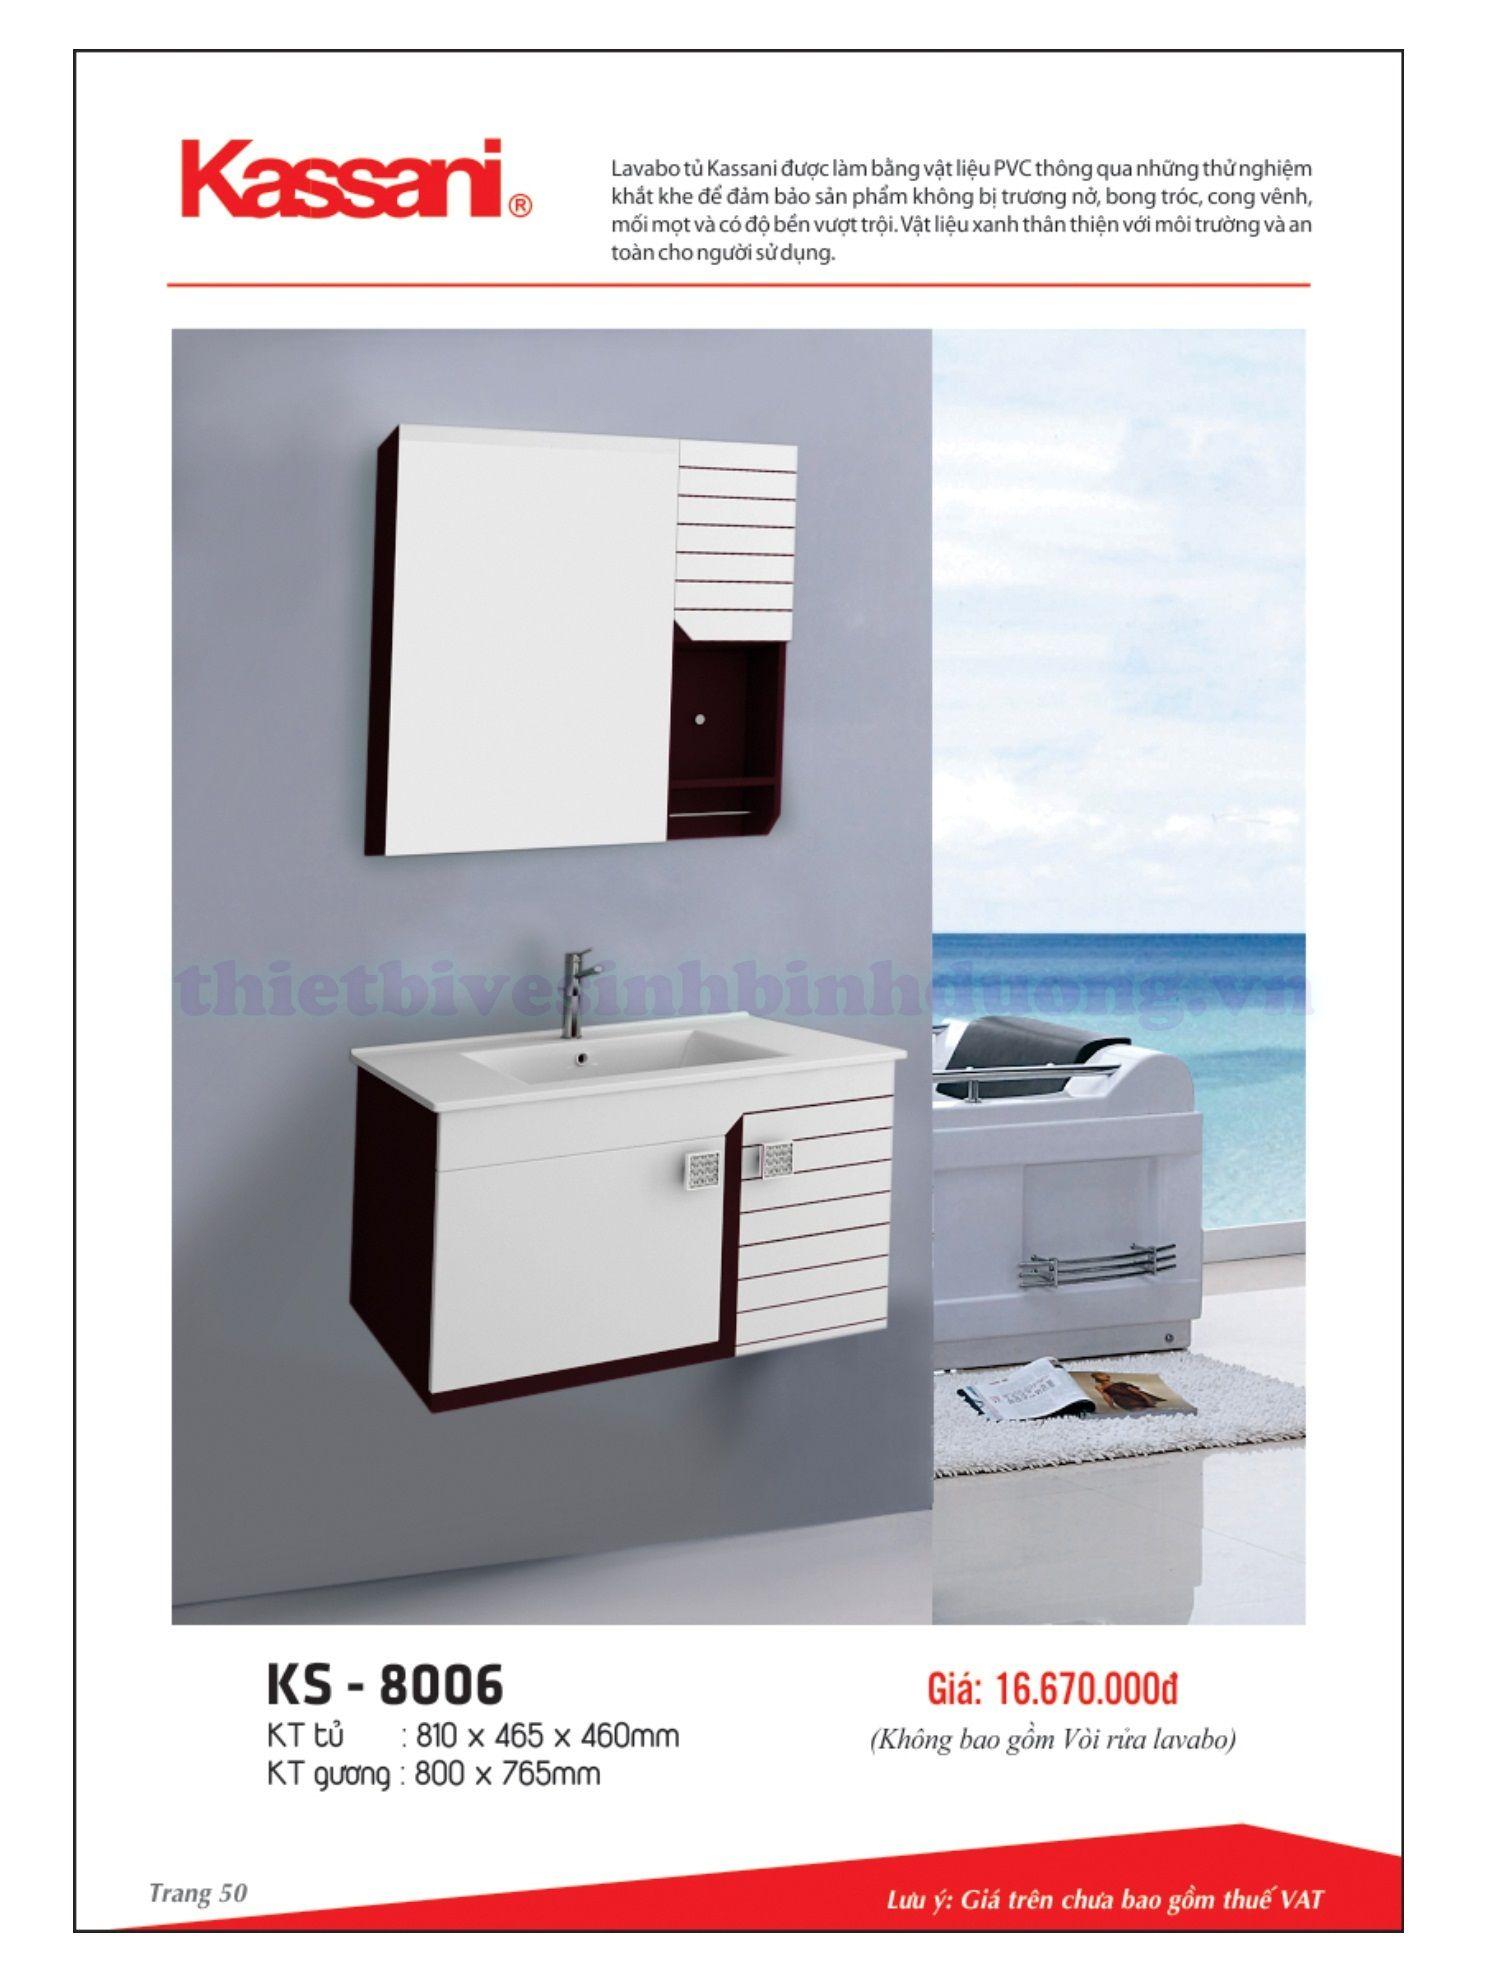 bo-tu-lavabo-kassani-ks-8006